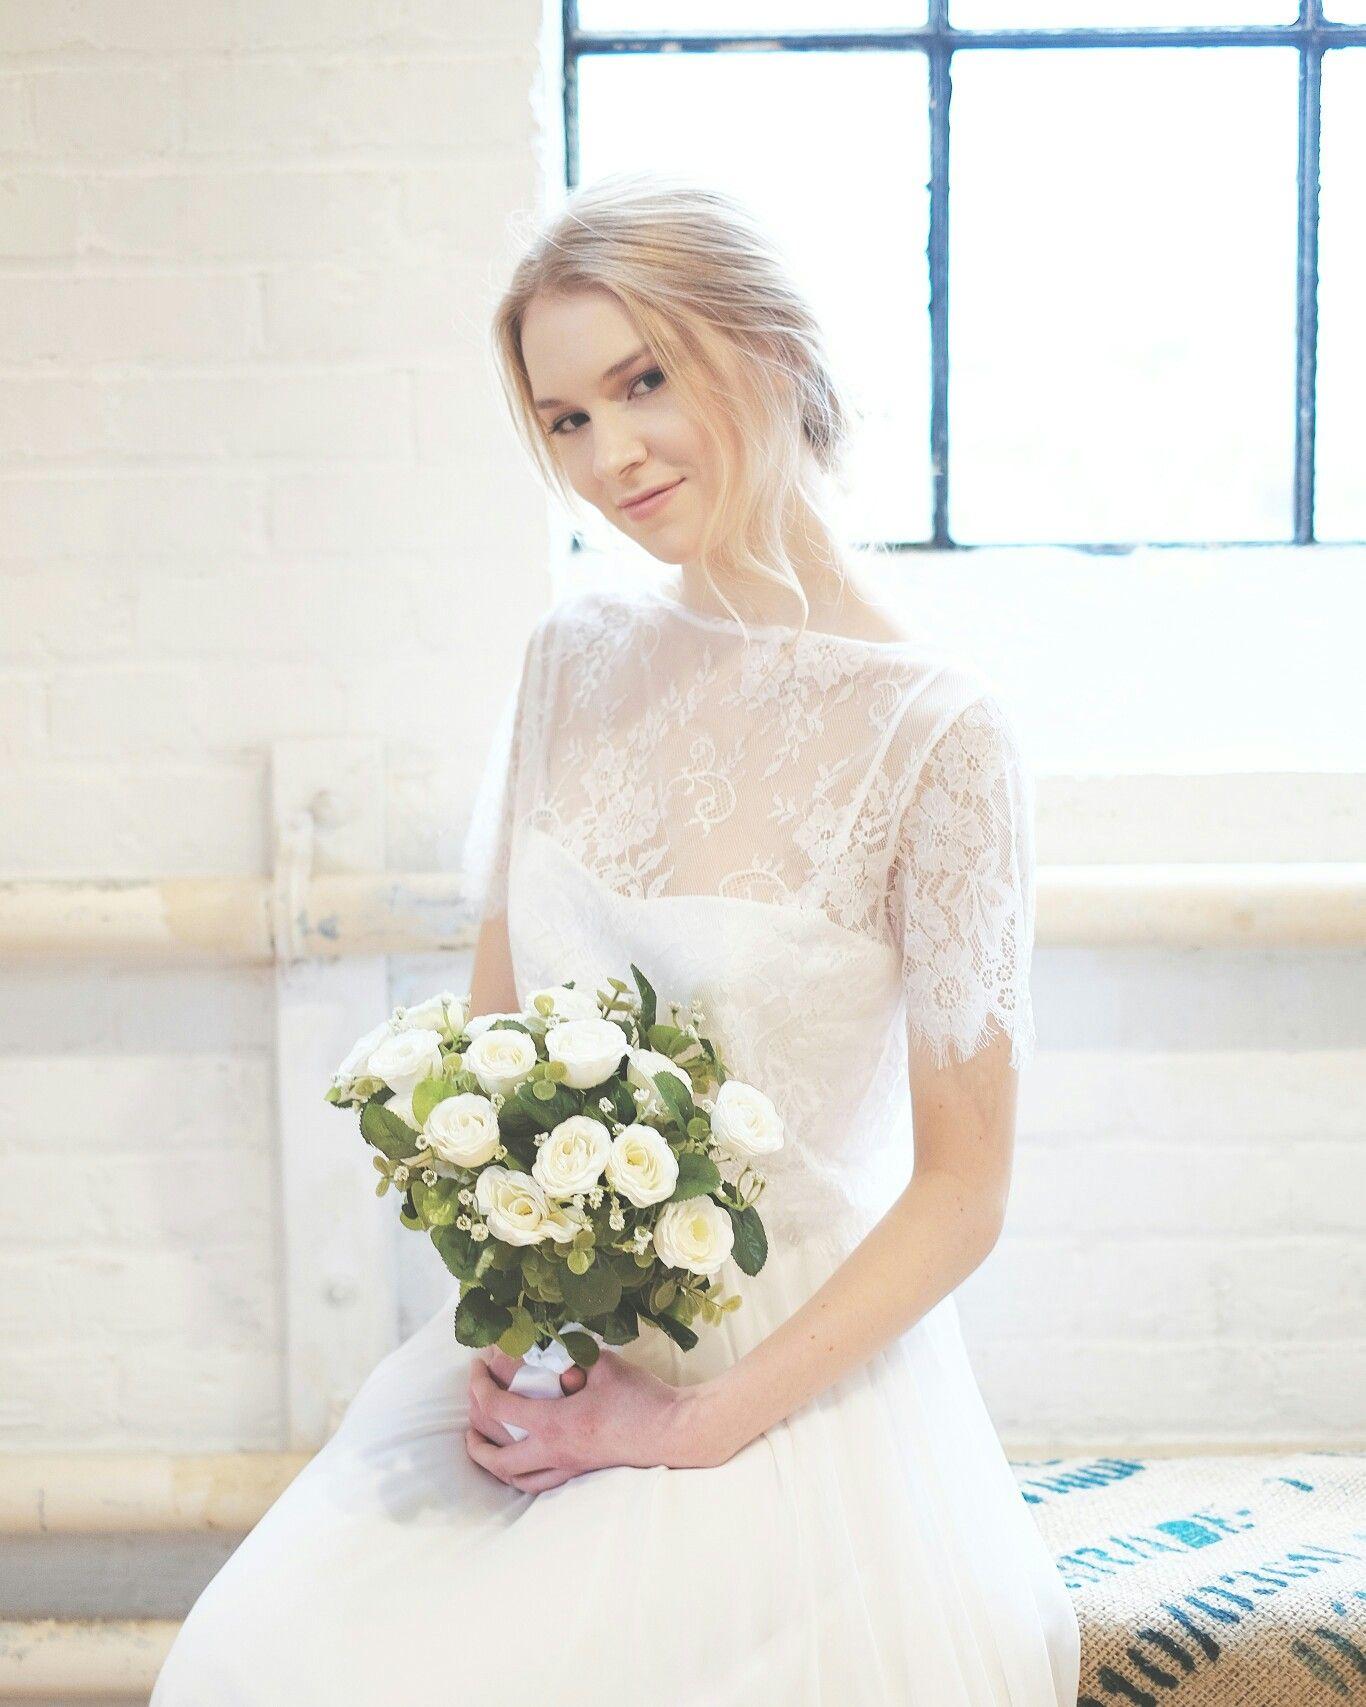 Emily dress lace top classic cropped top chiffon skirt wedding